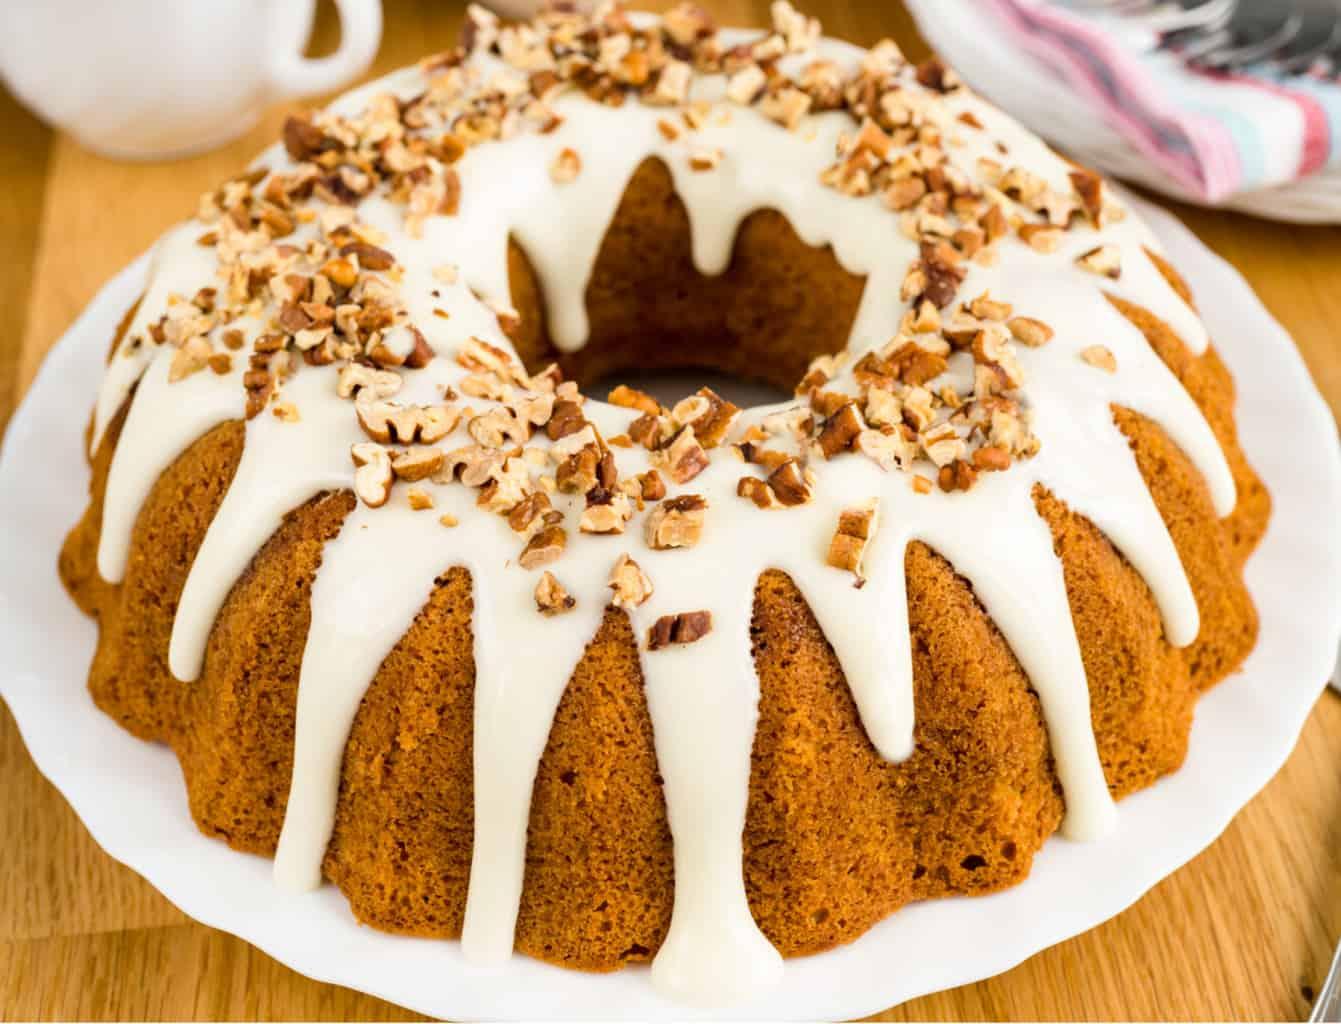 keto cinnamon bundt cake on a white plate